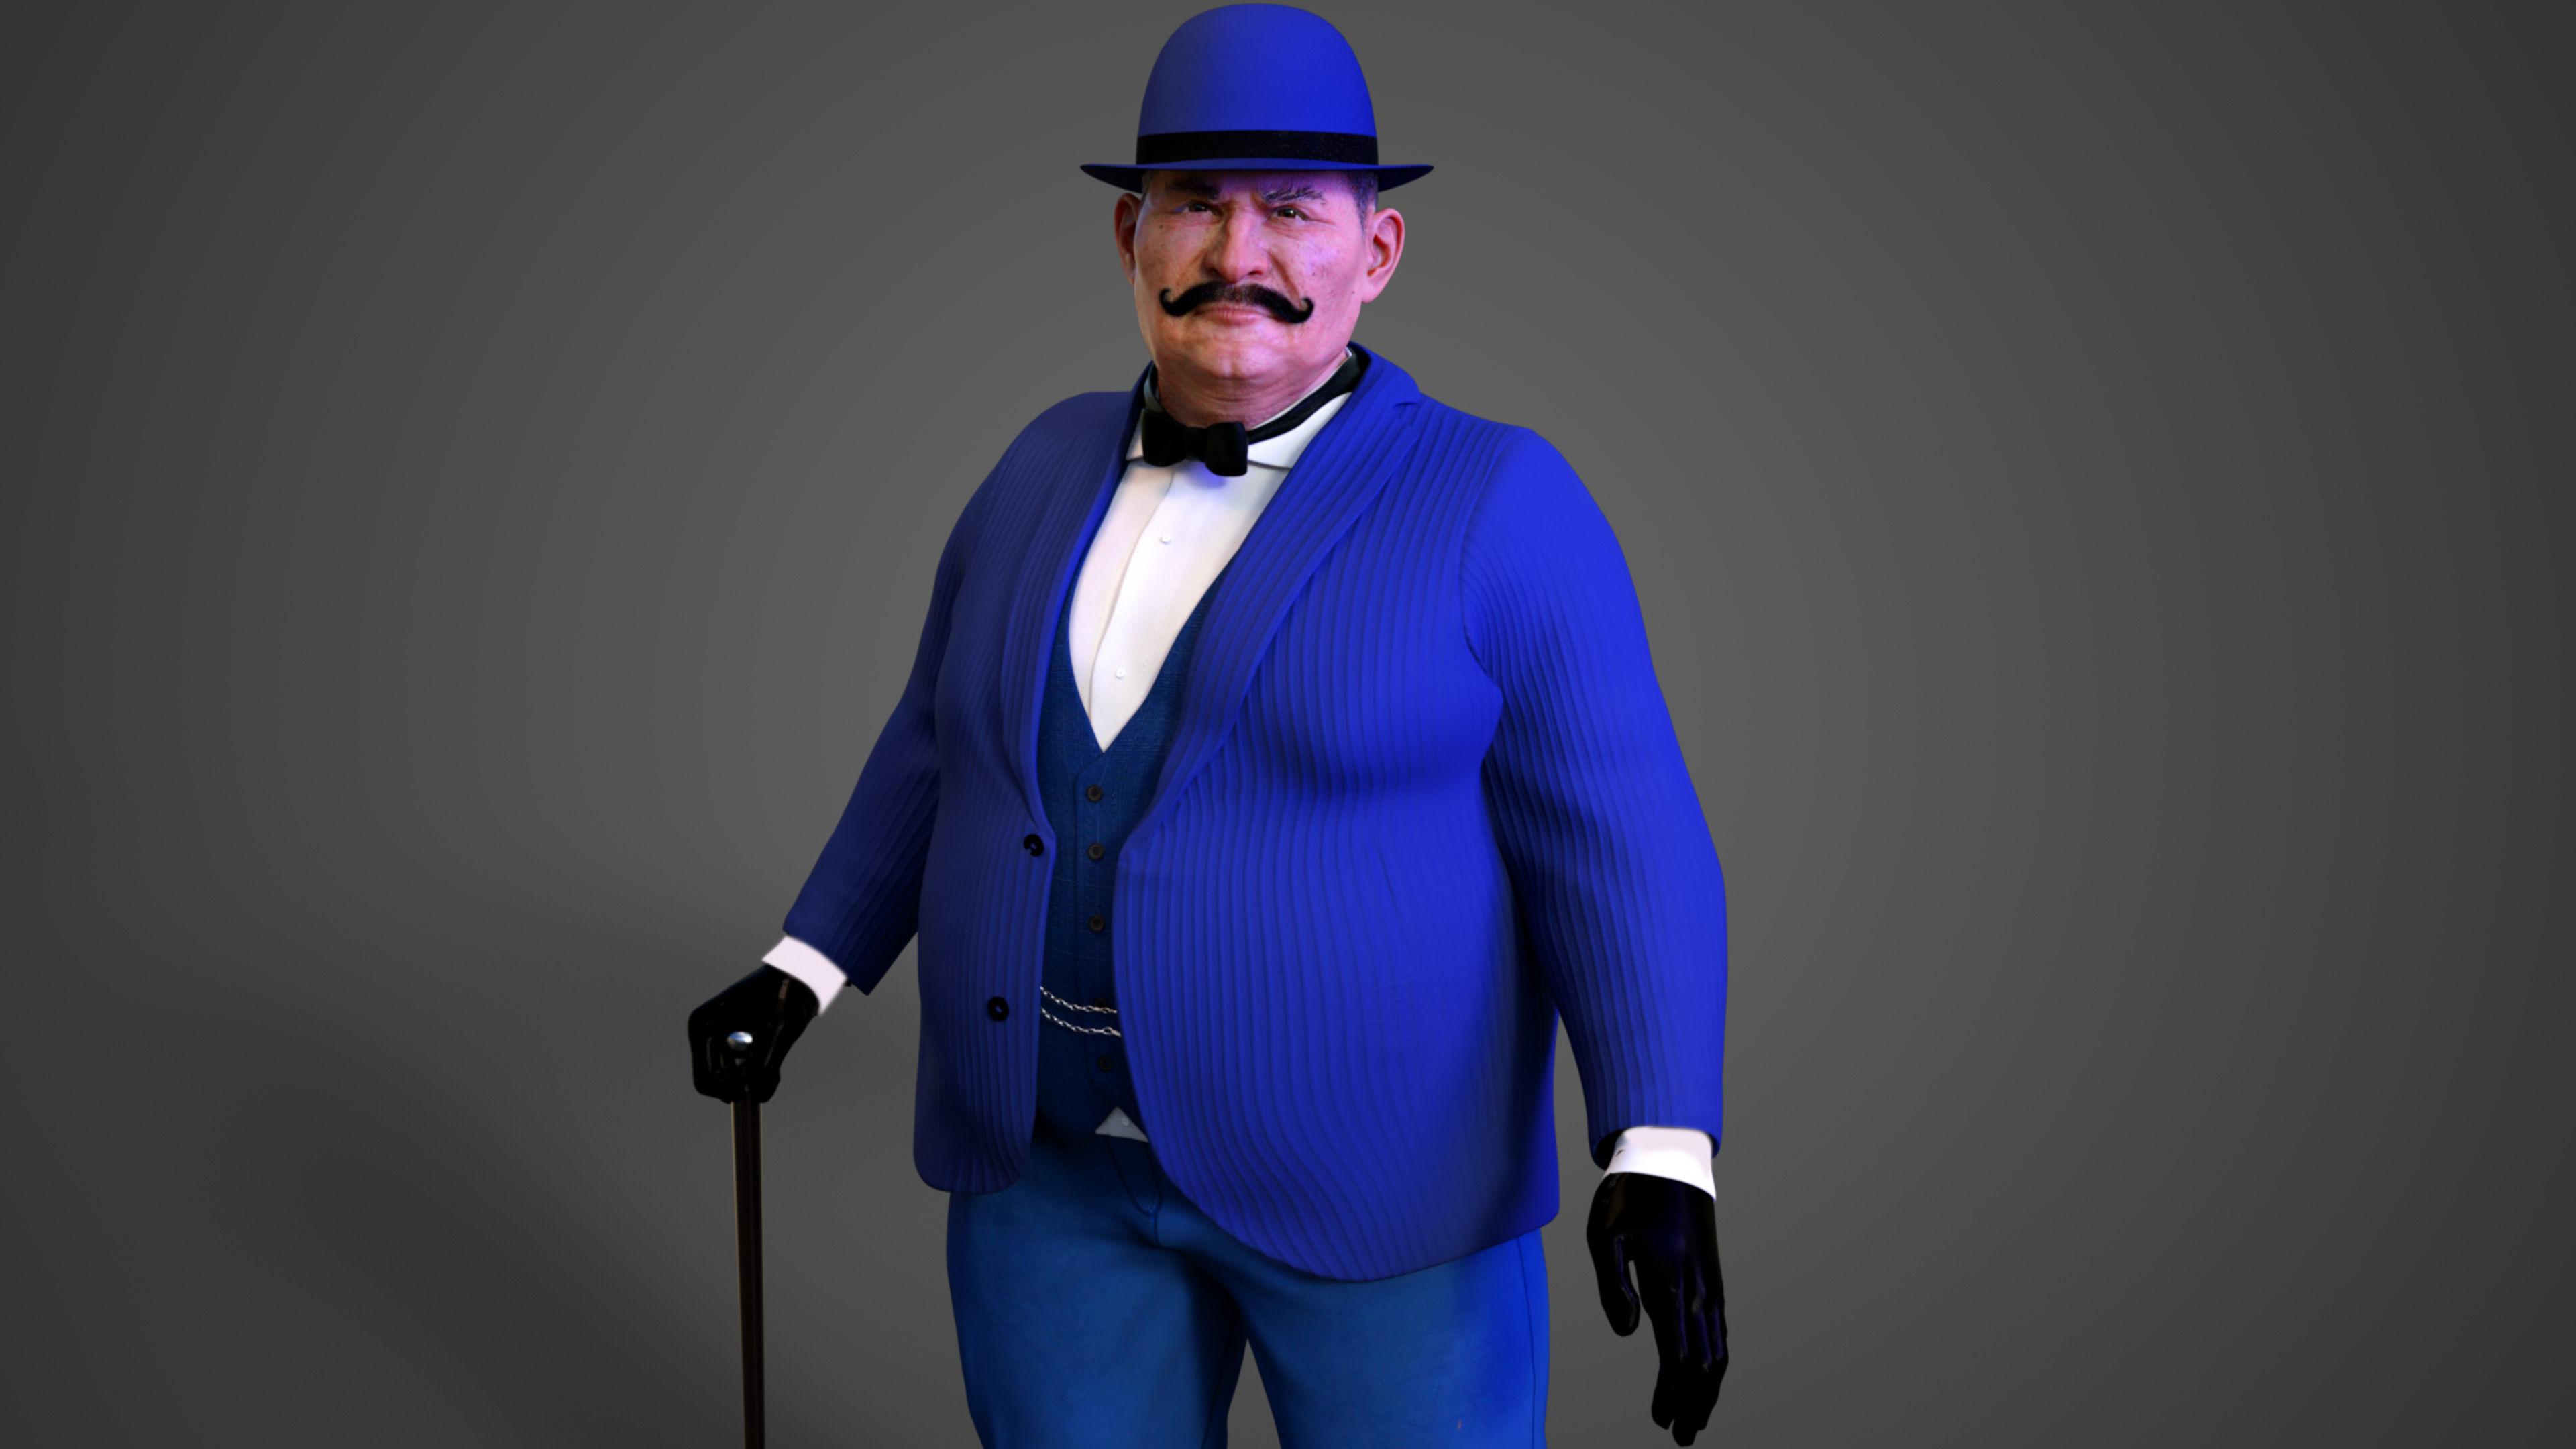 Hercules Poirot